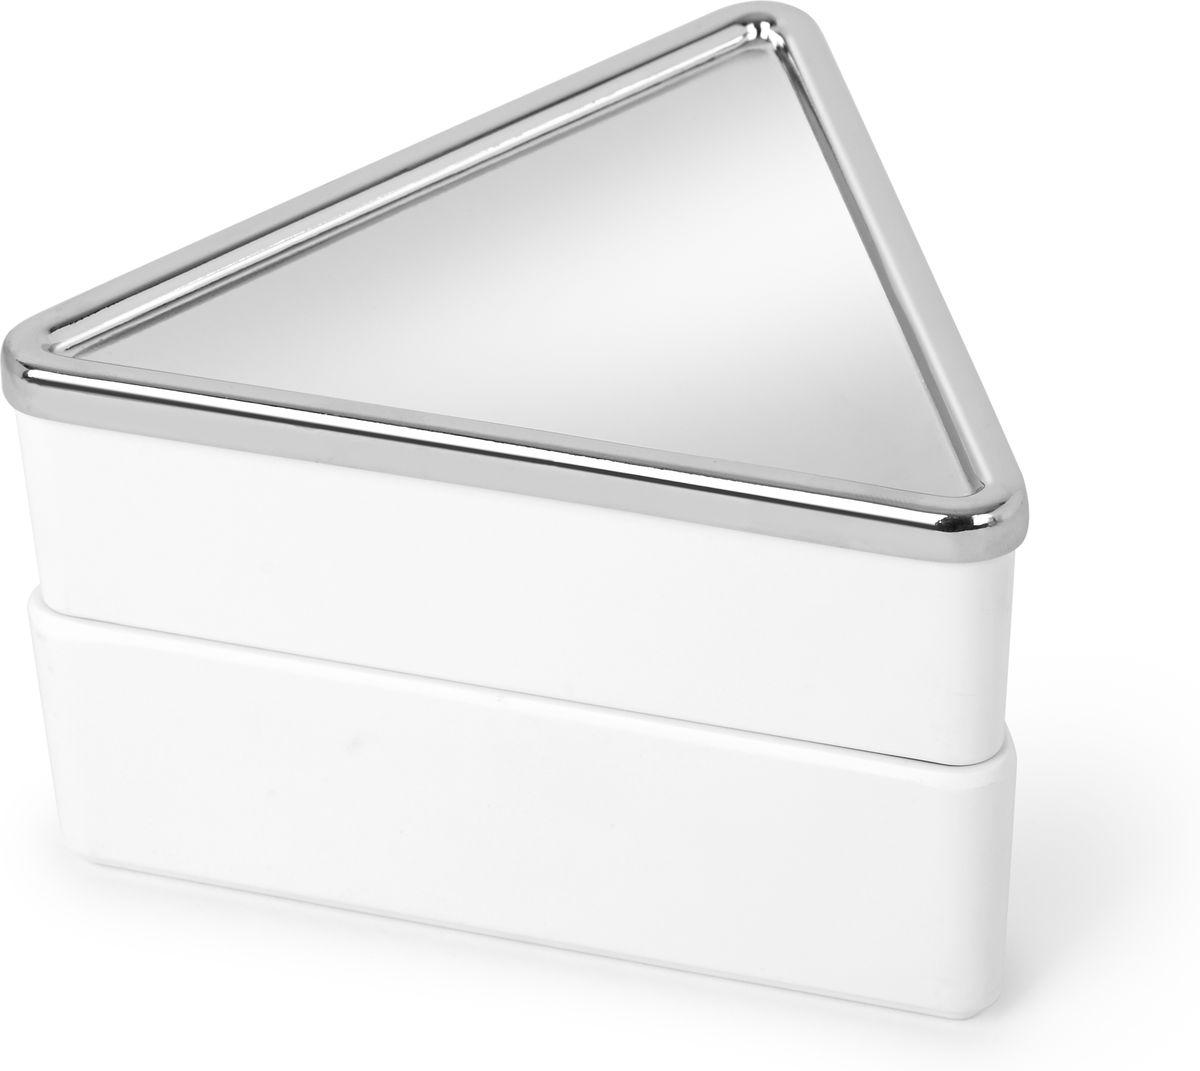 Фото - Шкатулка для украшений Umbra Trinity, цвет: белый, 13,9 х 13,9 х 8,9 см umbra шкатулка для украшений stowit